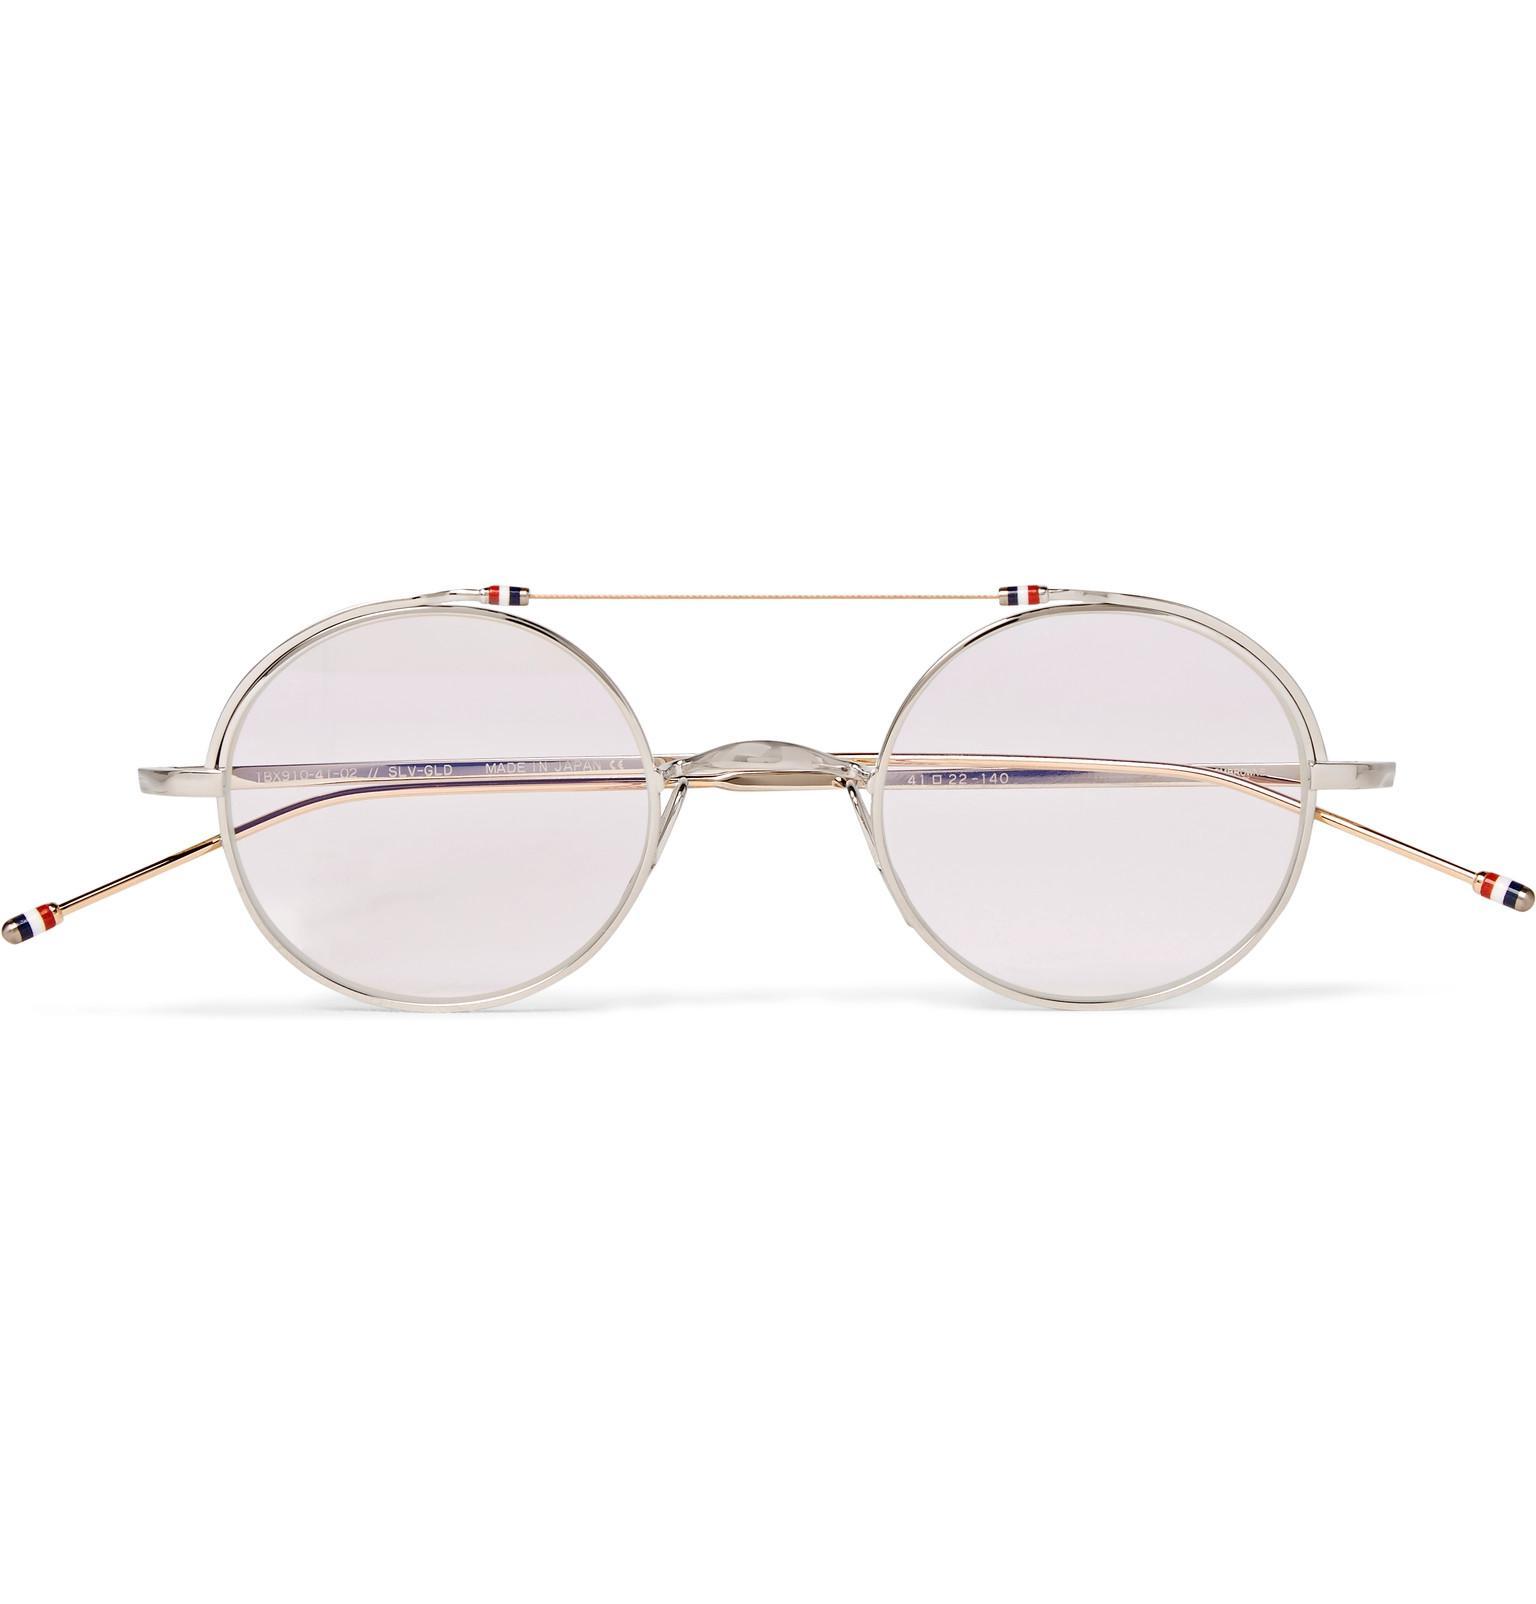 7eeb4ccb9e Thom Browne. Men s Metallic Round-frame Gold And Silver-tone Optical Glasses